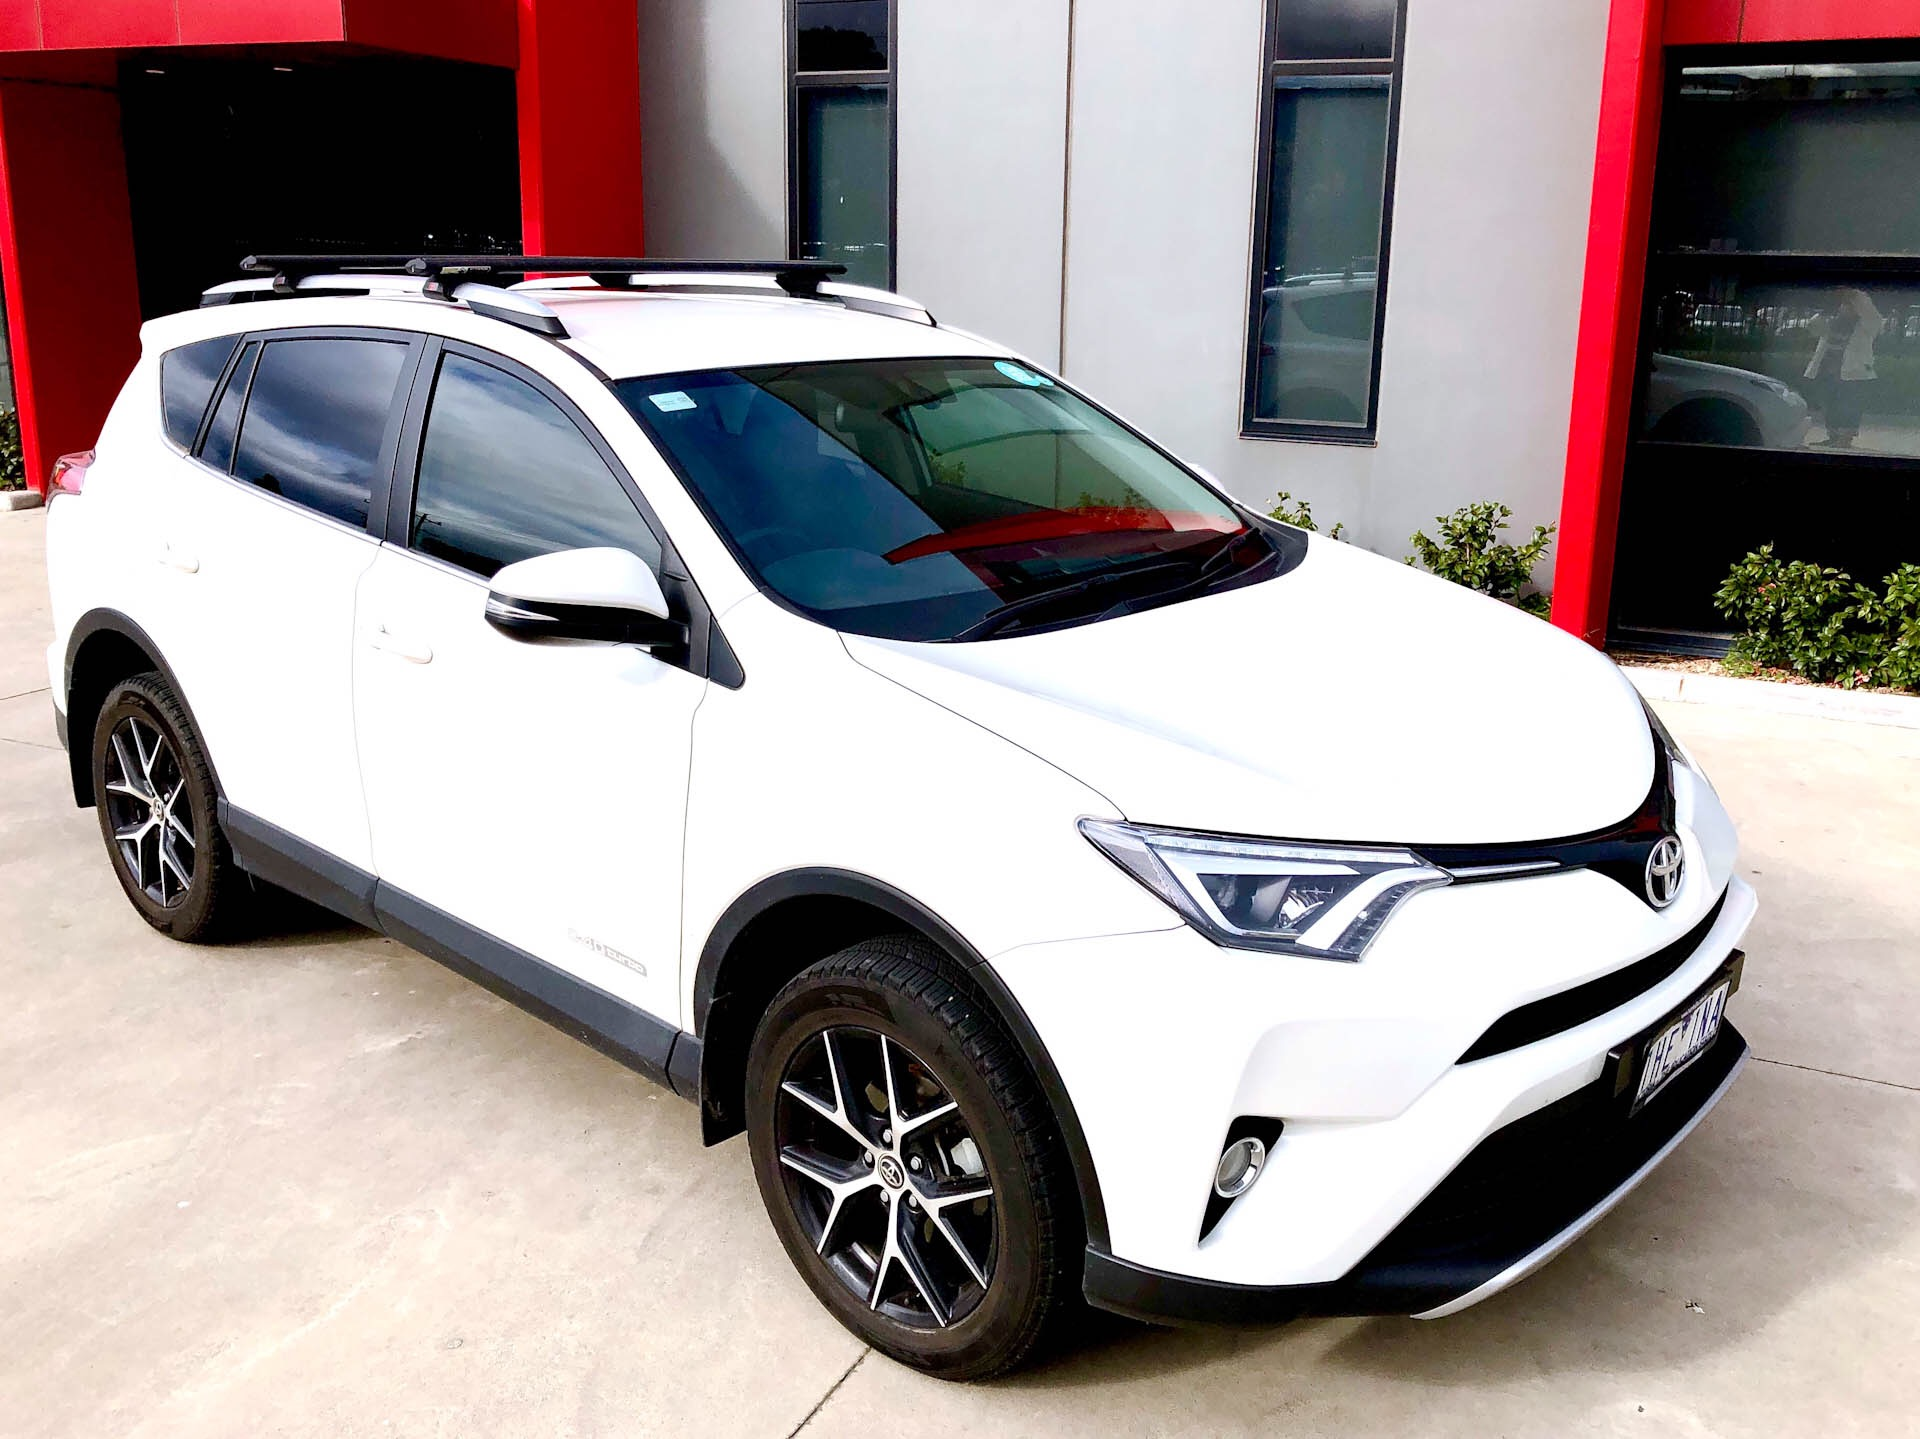 Picture of Chun Pang David's 2015 Toyota RAV4